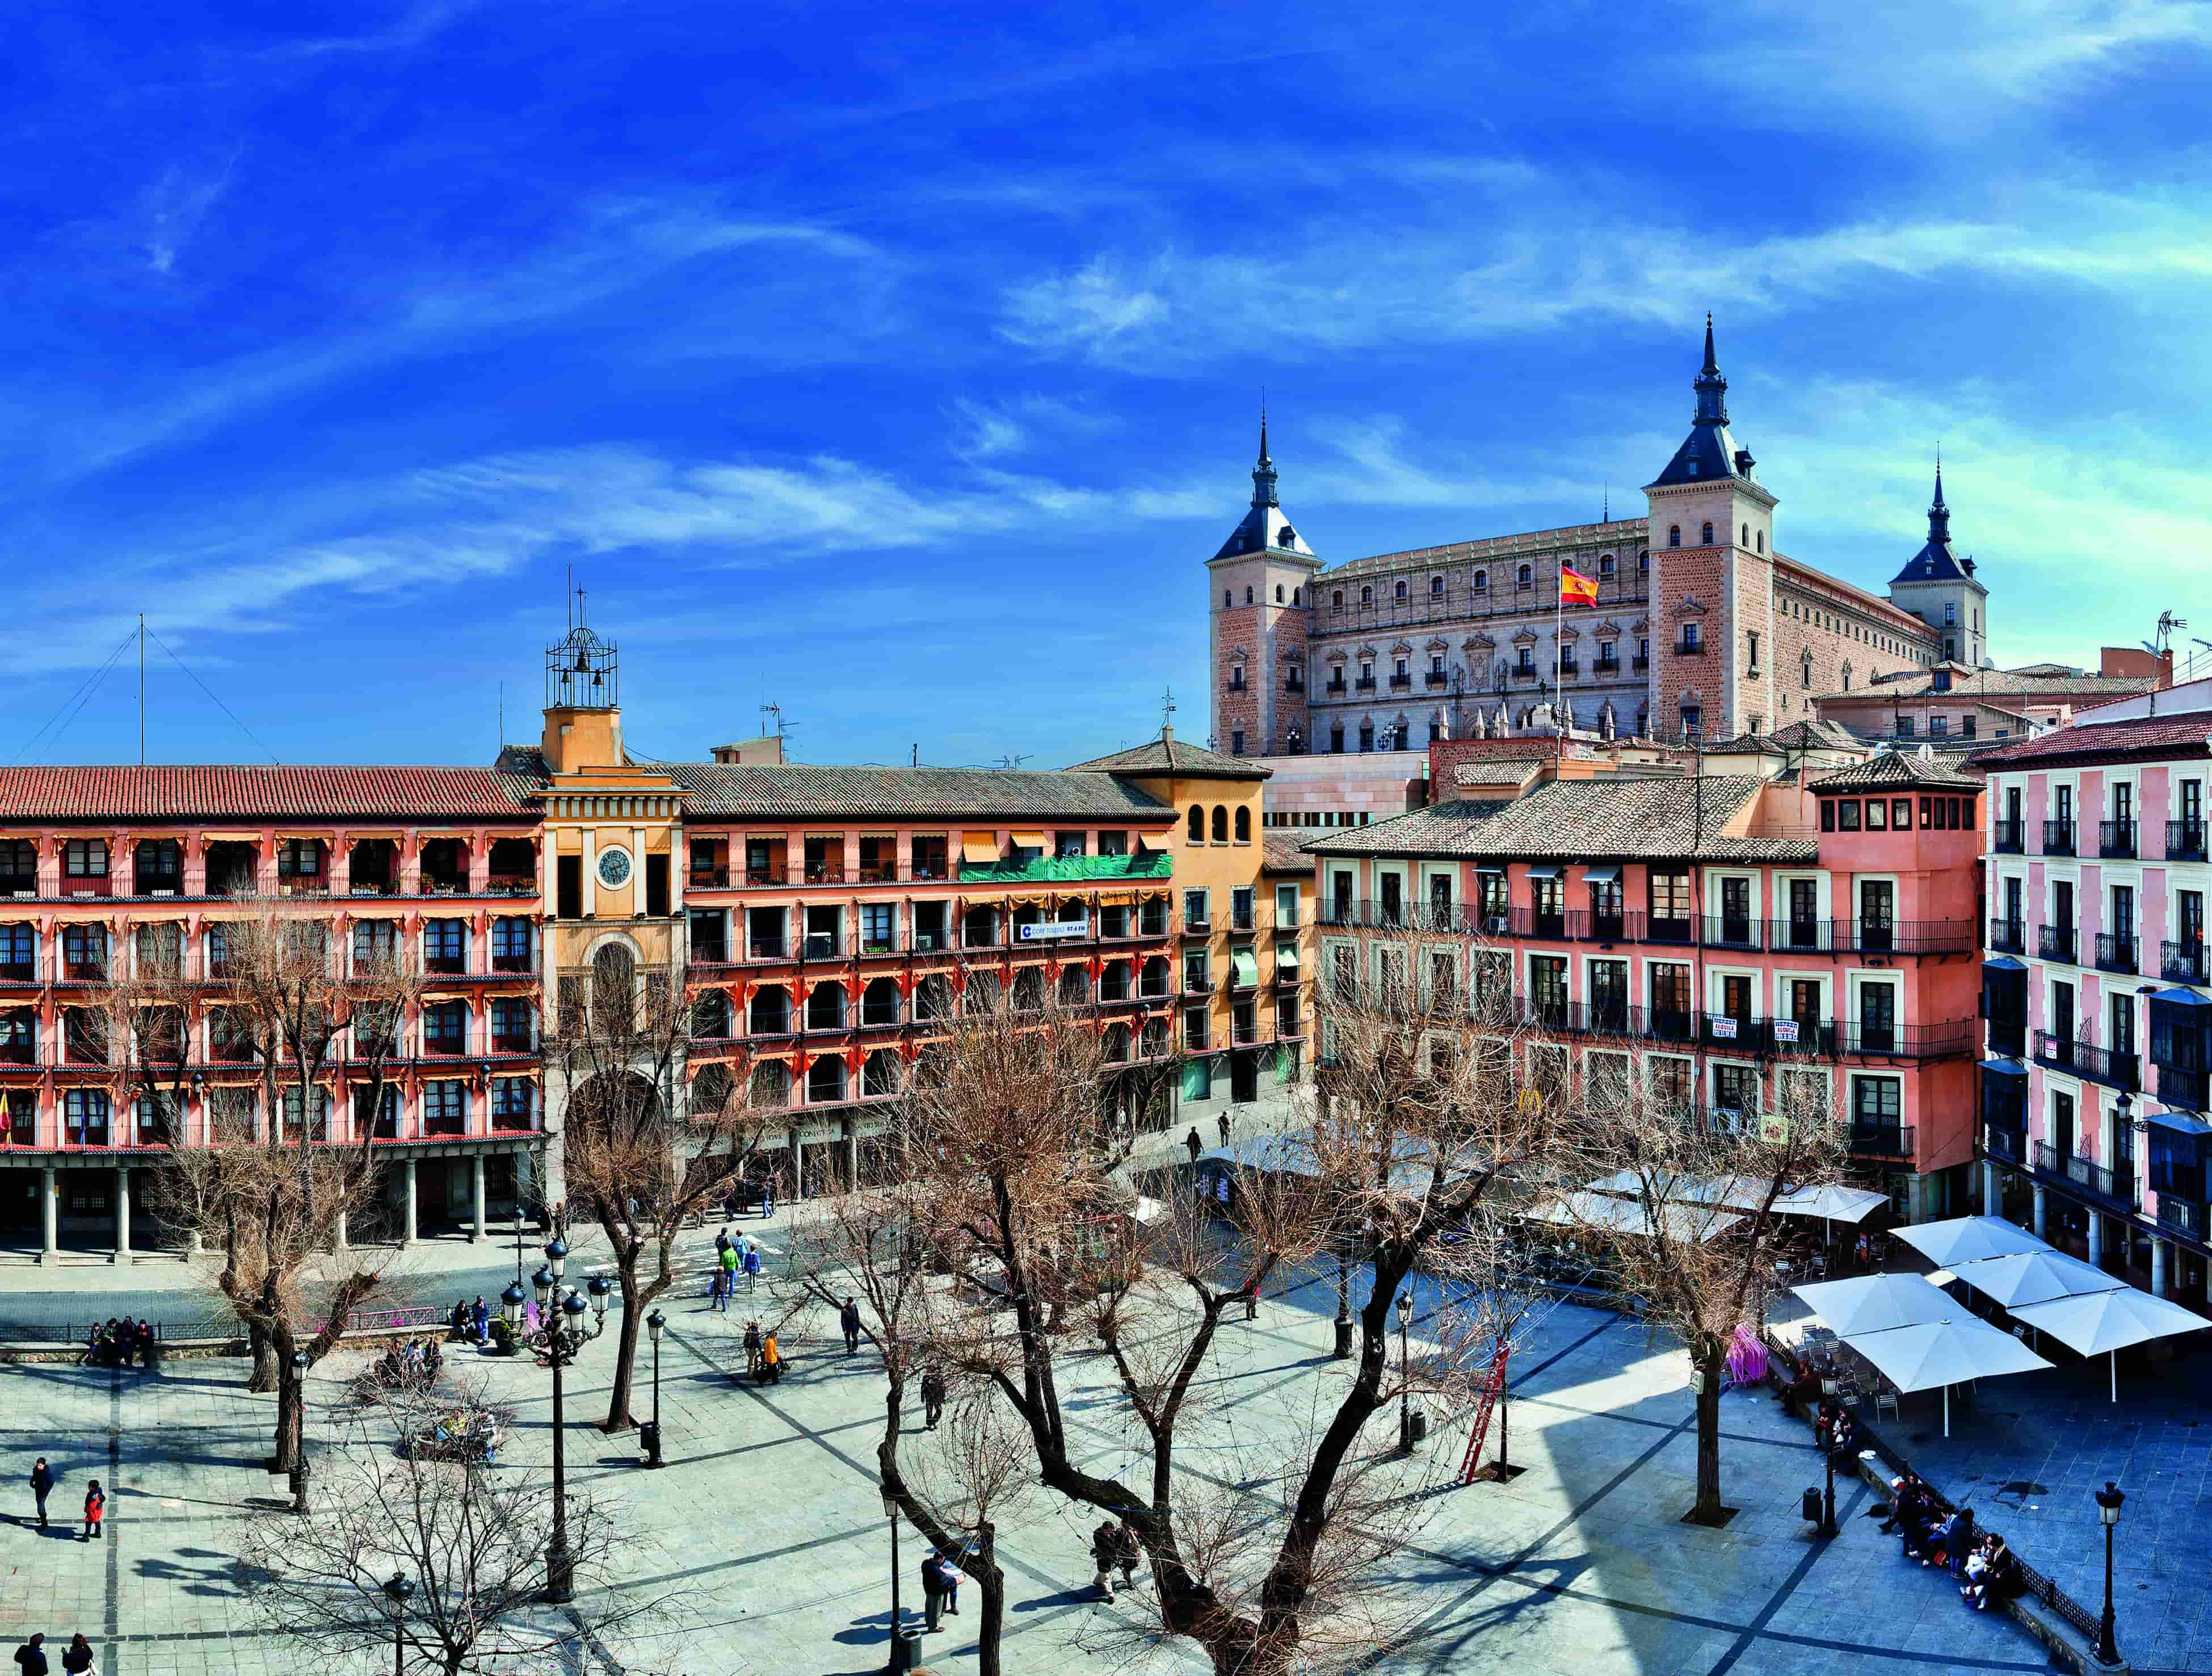 Plaza Zodocover à Tolède en voyage en Espagne